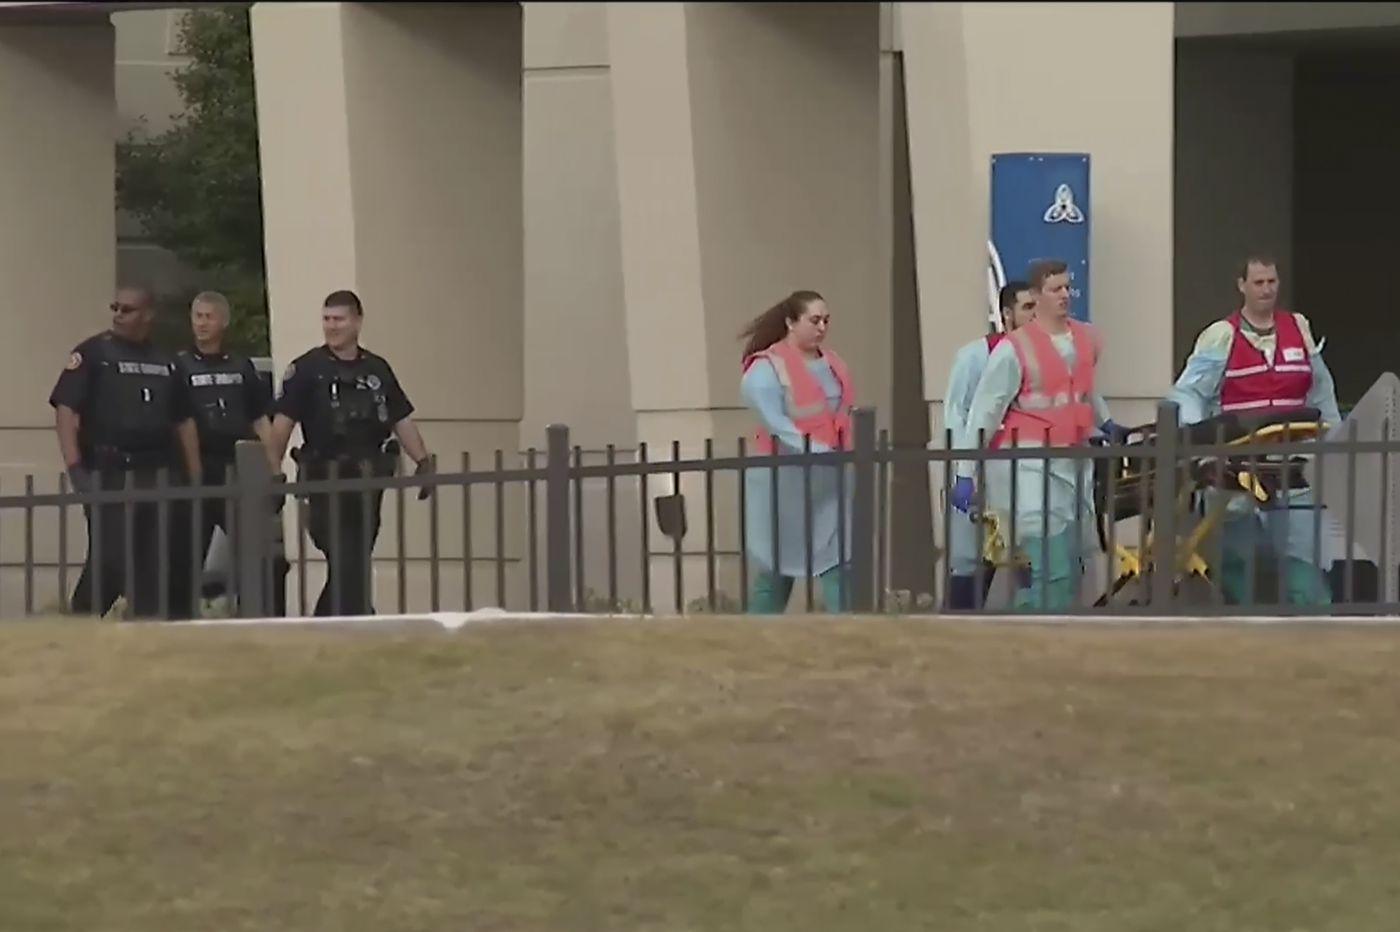 Official: Pensacola shooter was Saudi aviation student